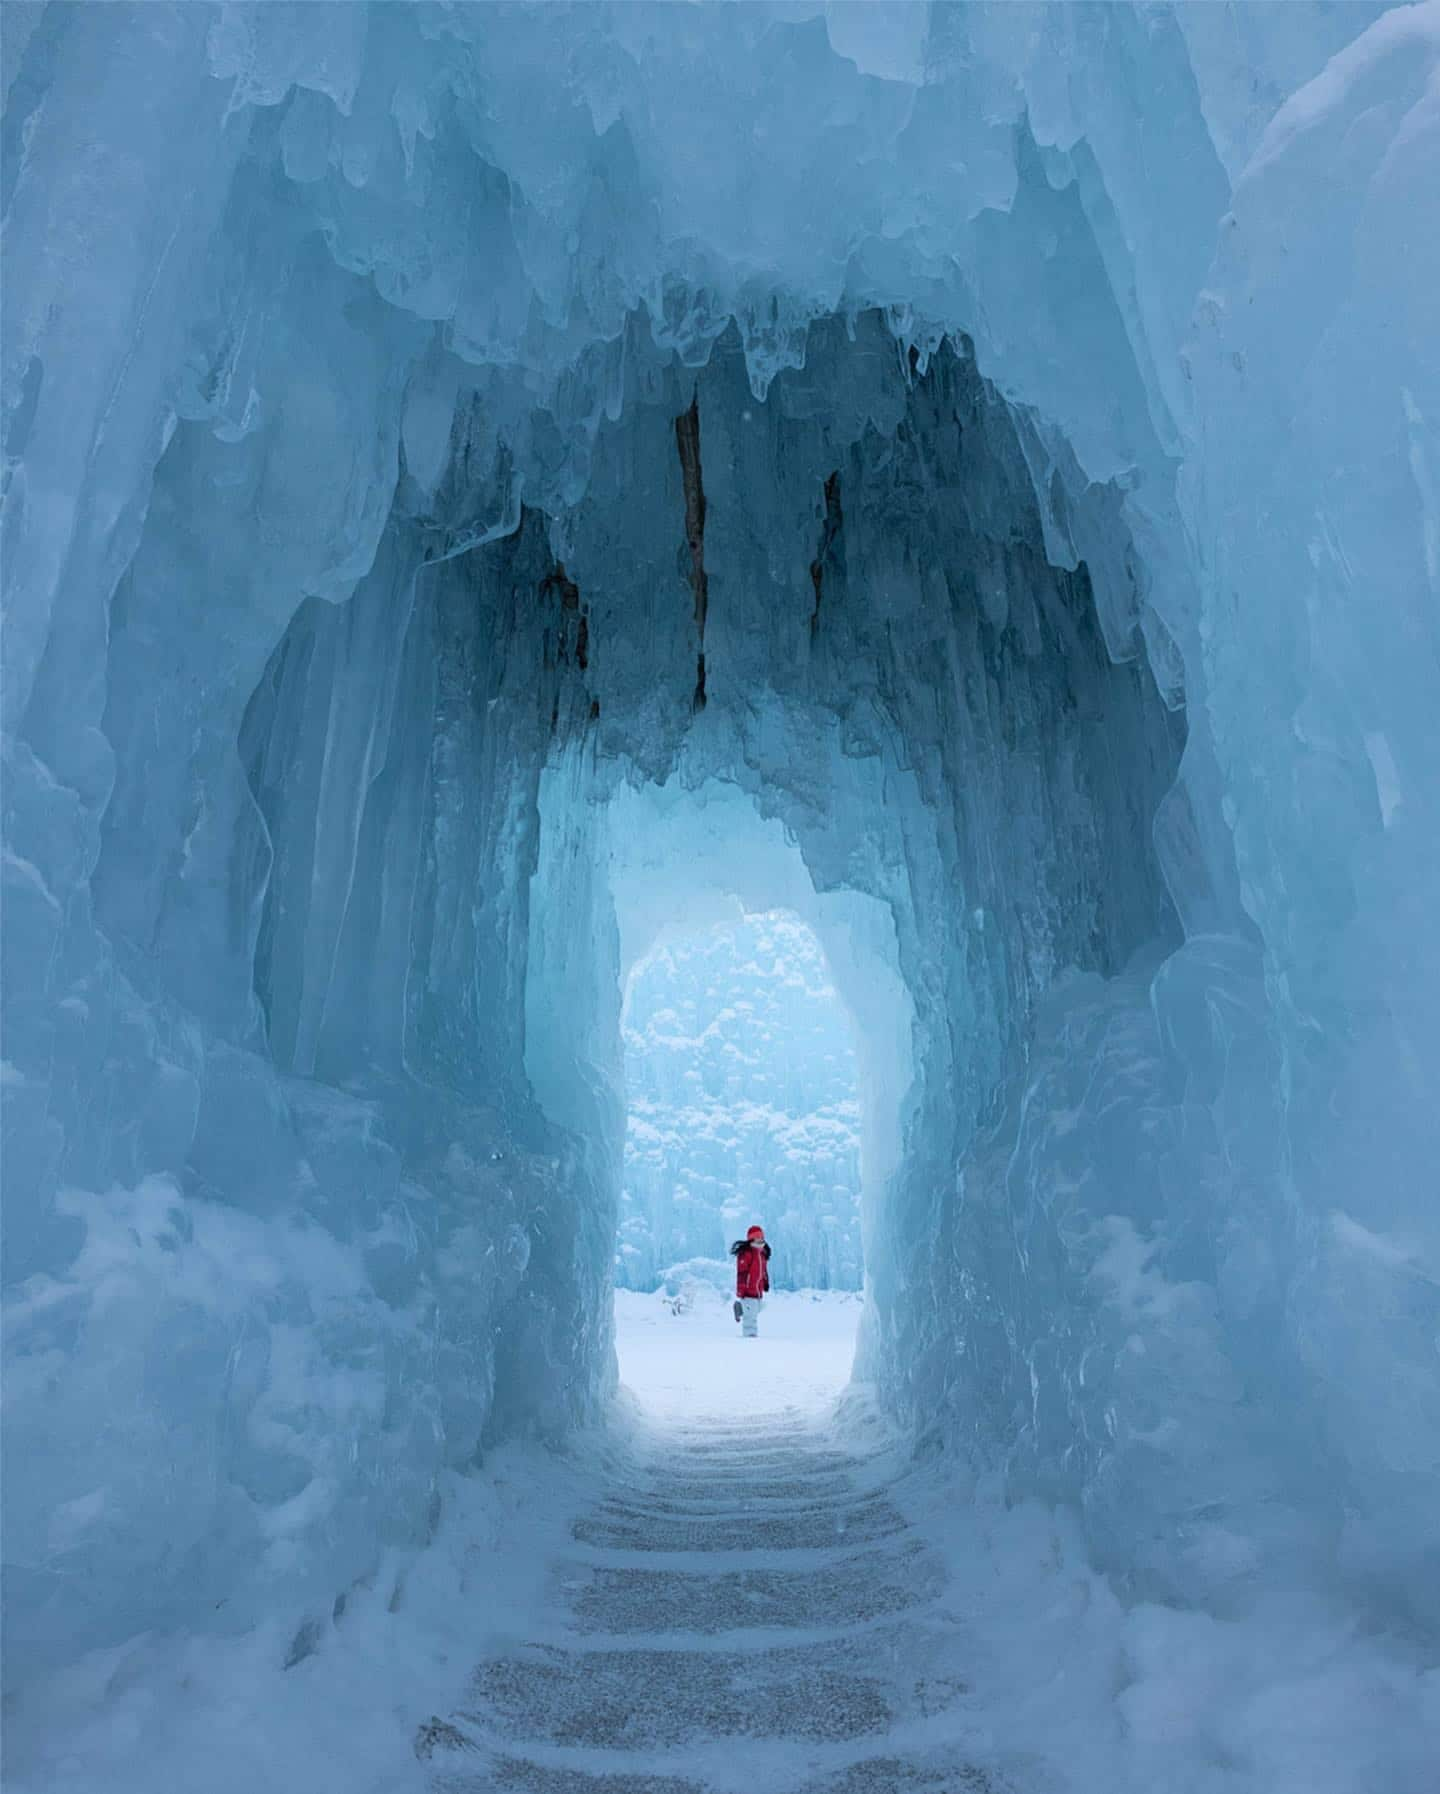 Ice Cave in Hokkaido